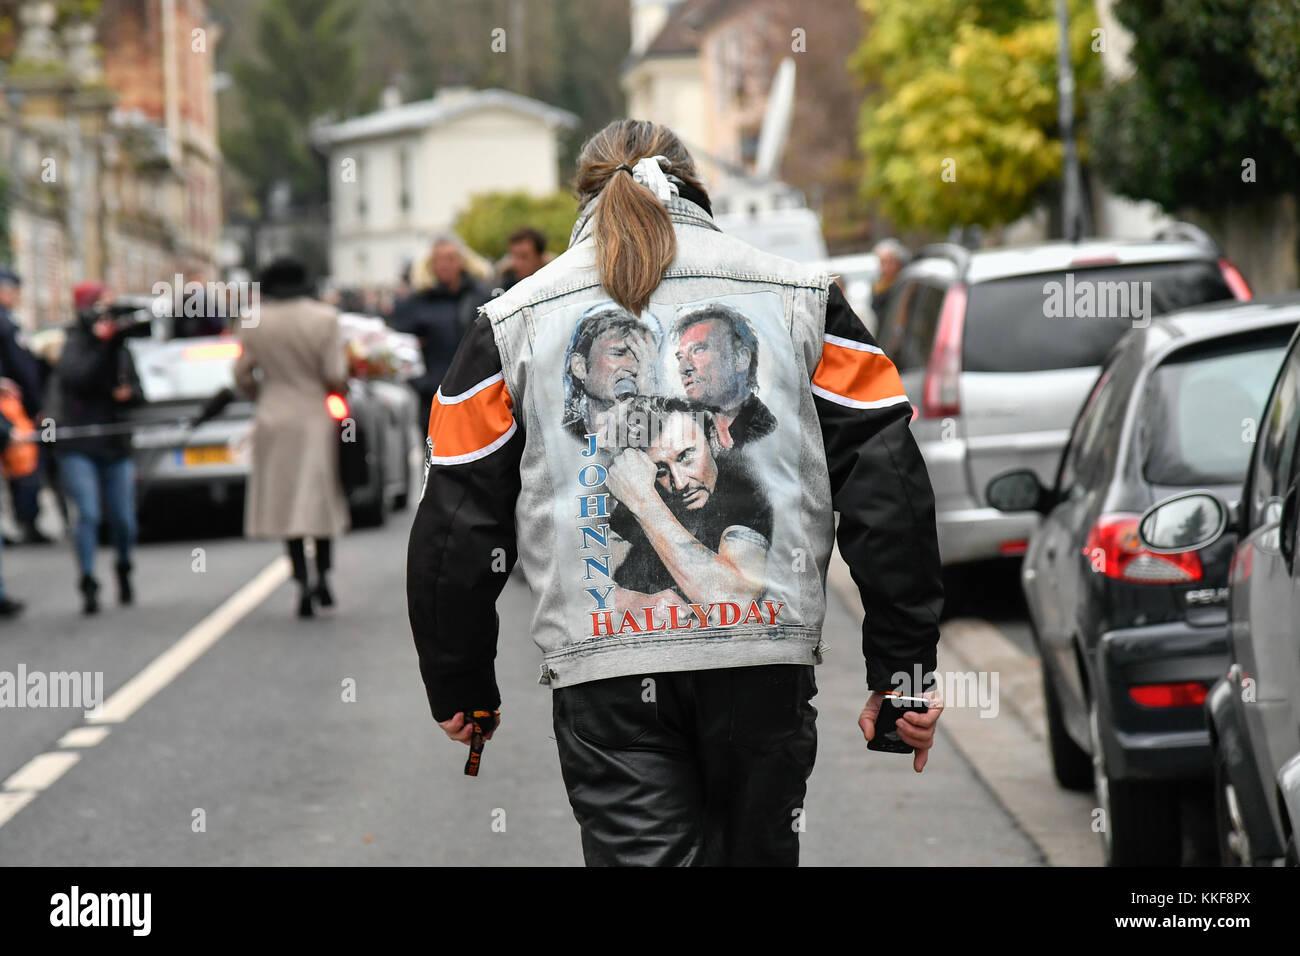 Marne La Coquette, France. 06th Dec, 2017. Julien Mattia / Le Pictorium -  Death of Johnny Hallyday -  06/12/2017 - Stock Image